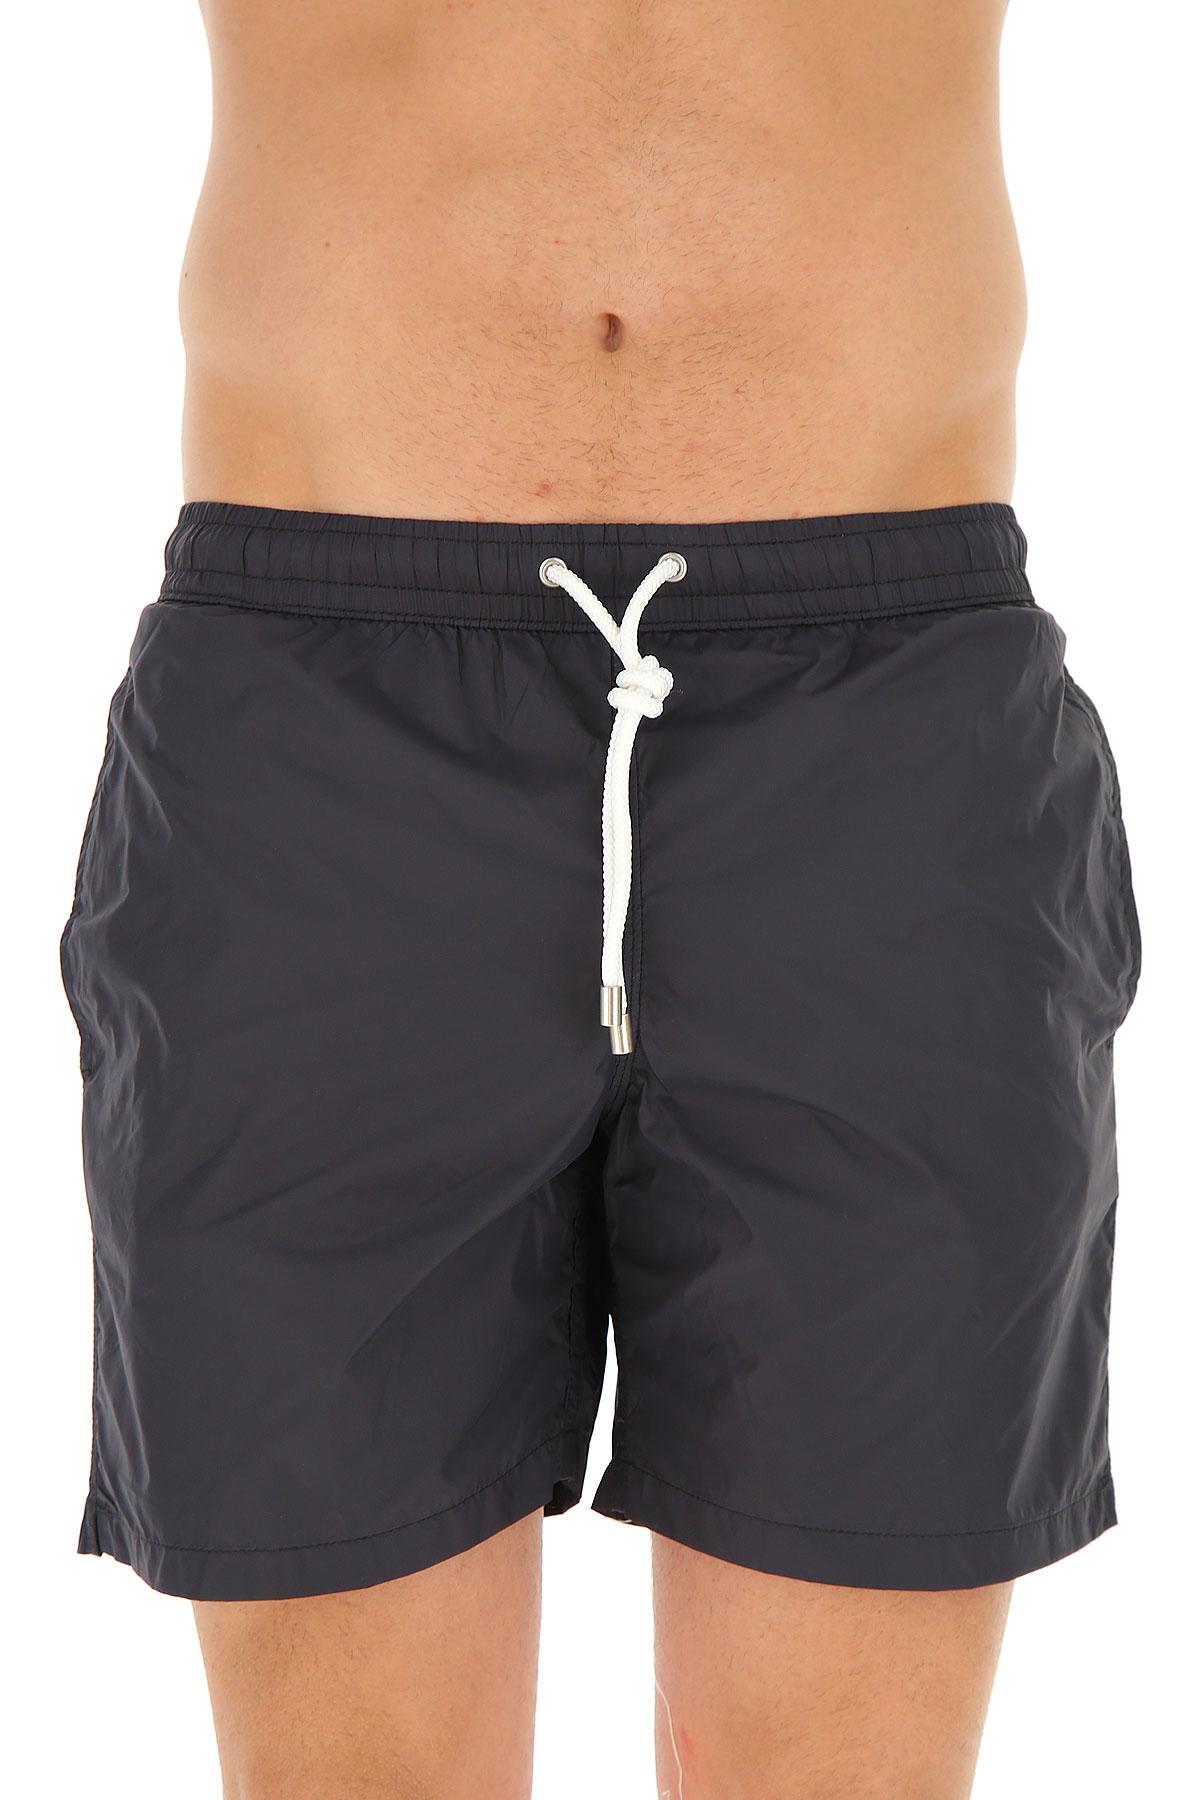 Image of Hartford Swim Shorts Trunks for Men On Sale, Black, polyamide, 2017, L XXL